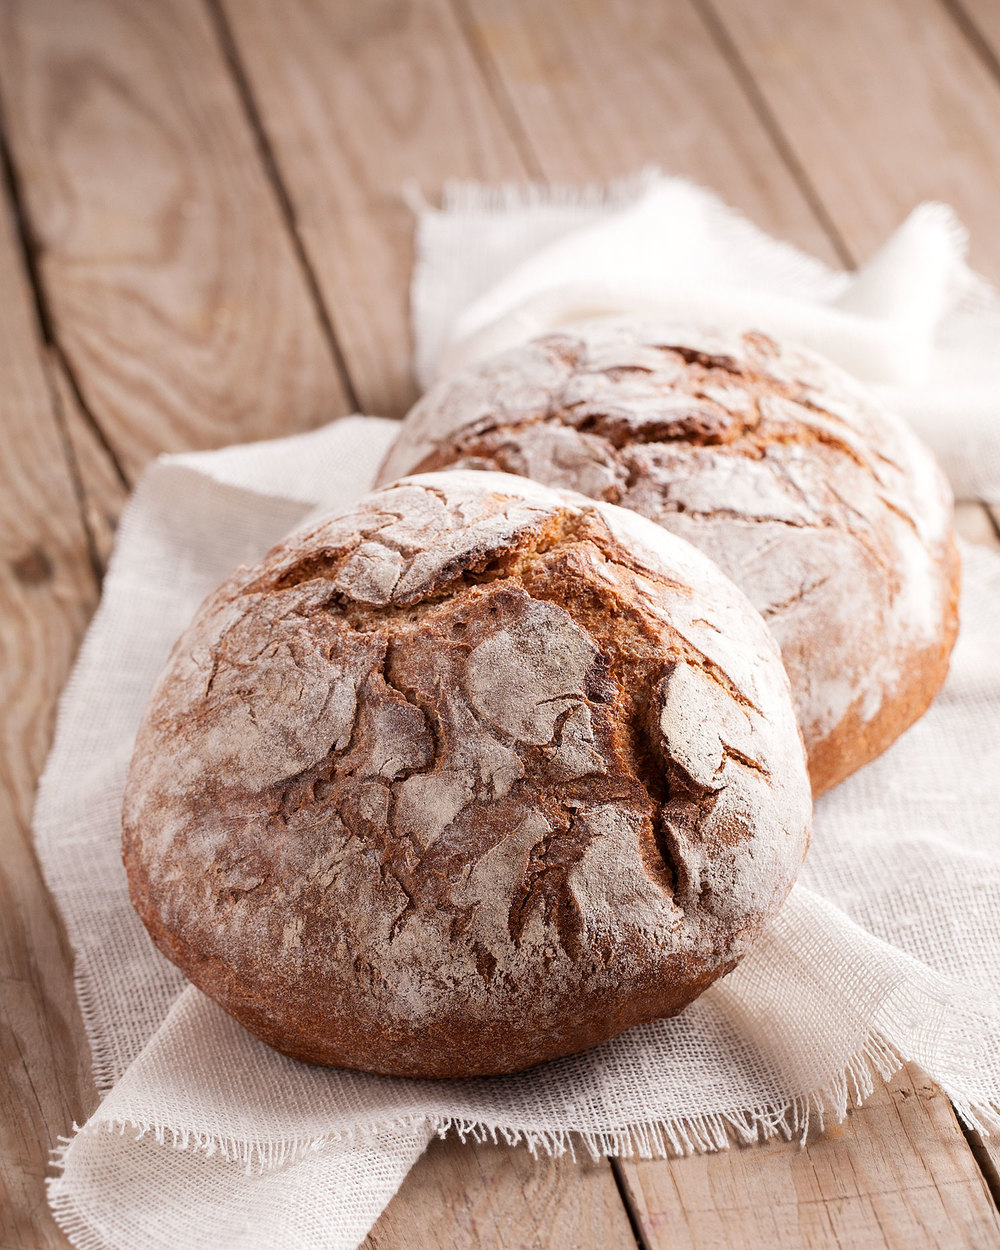 corina-landa-food-photography-fotografia-gastronomica-44.jpg